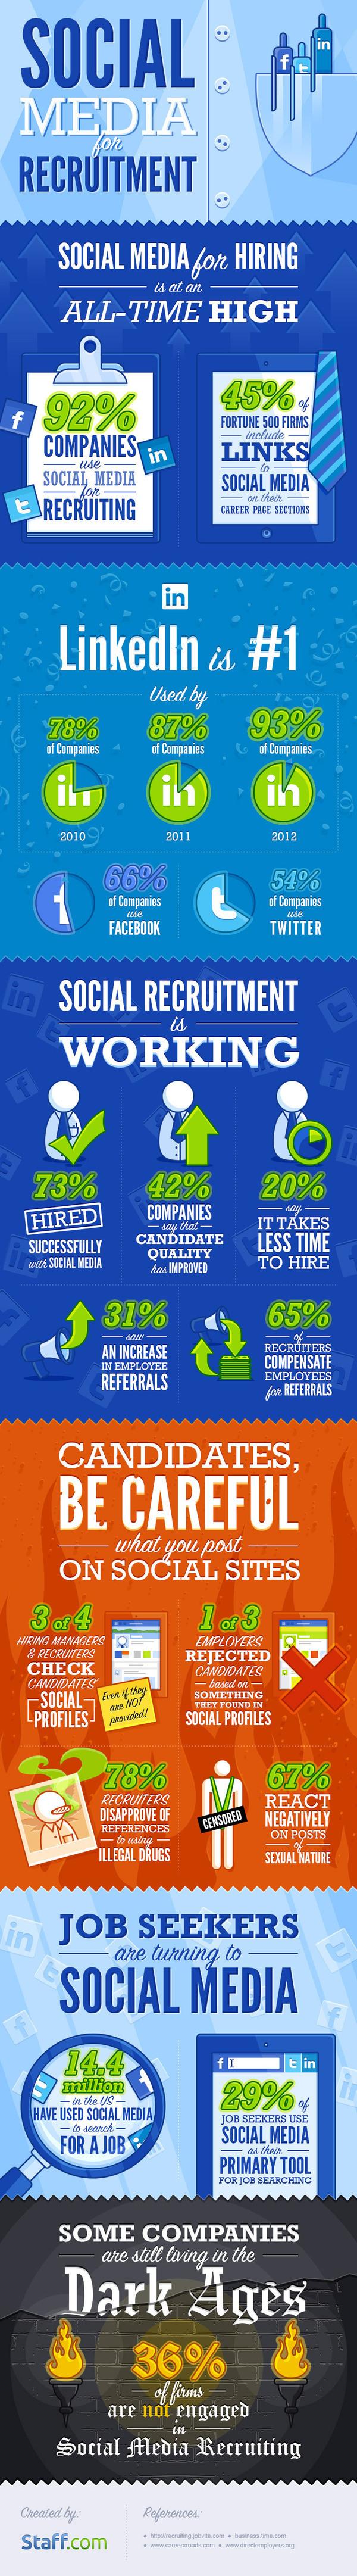 the-power-of-social-media-recruiting_5258d9490deb6